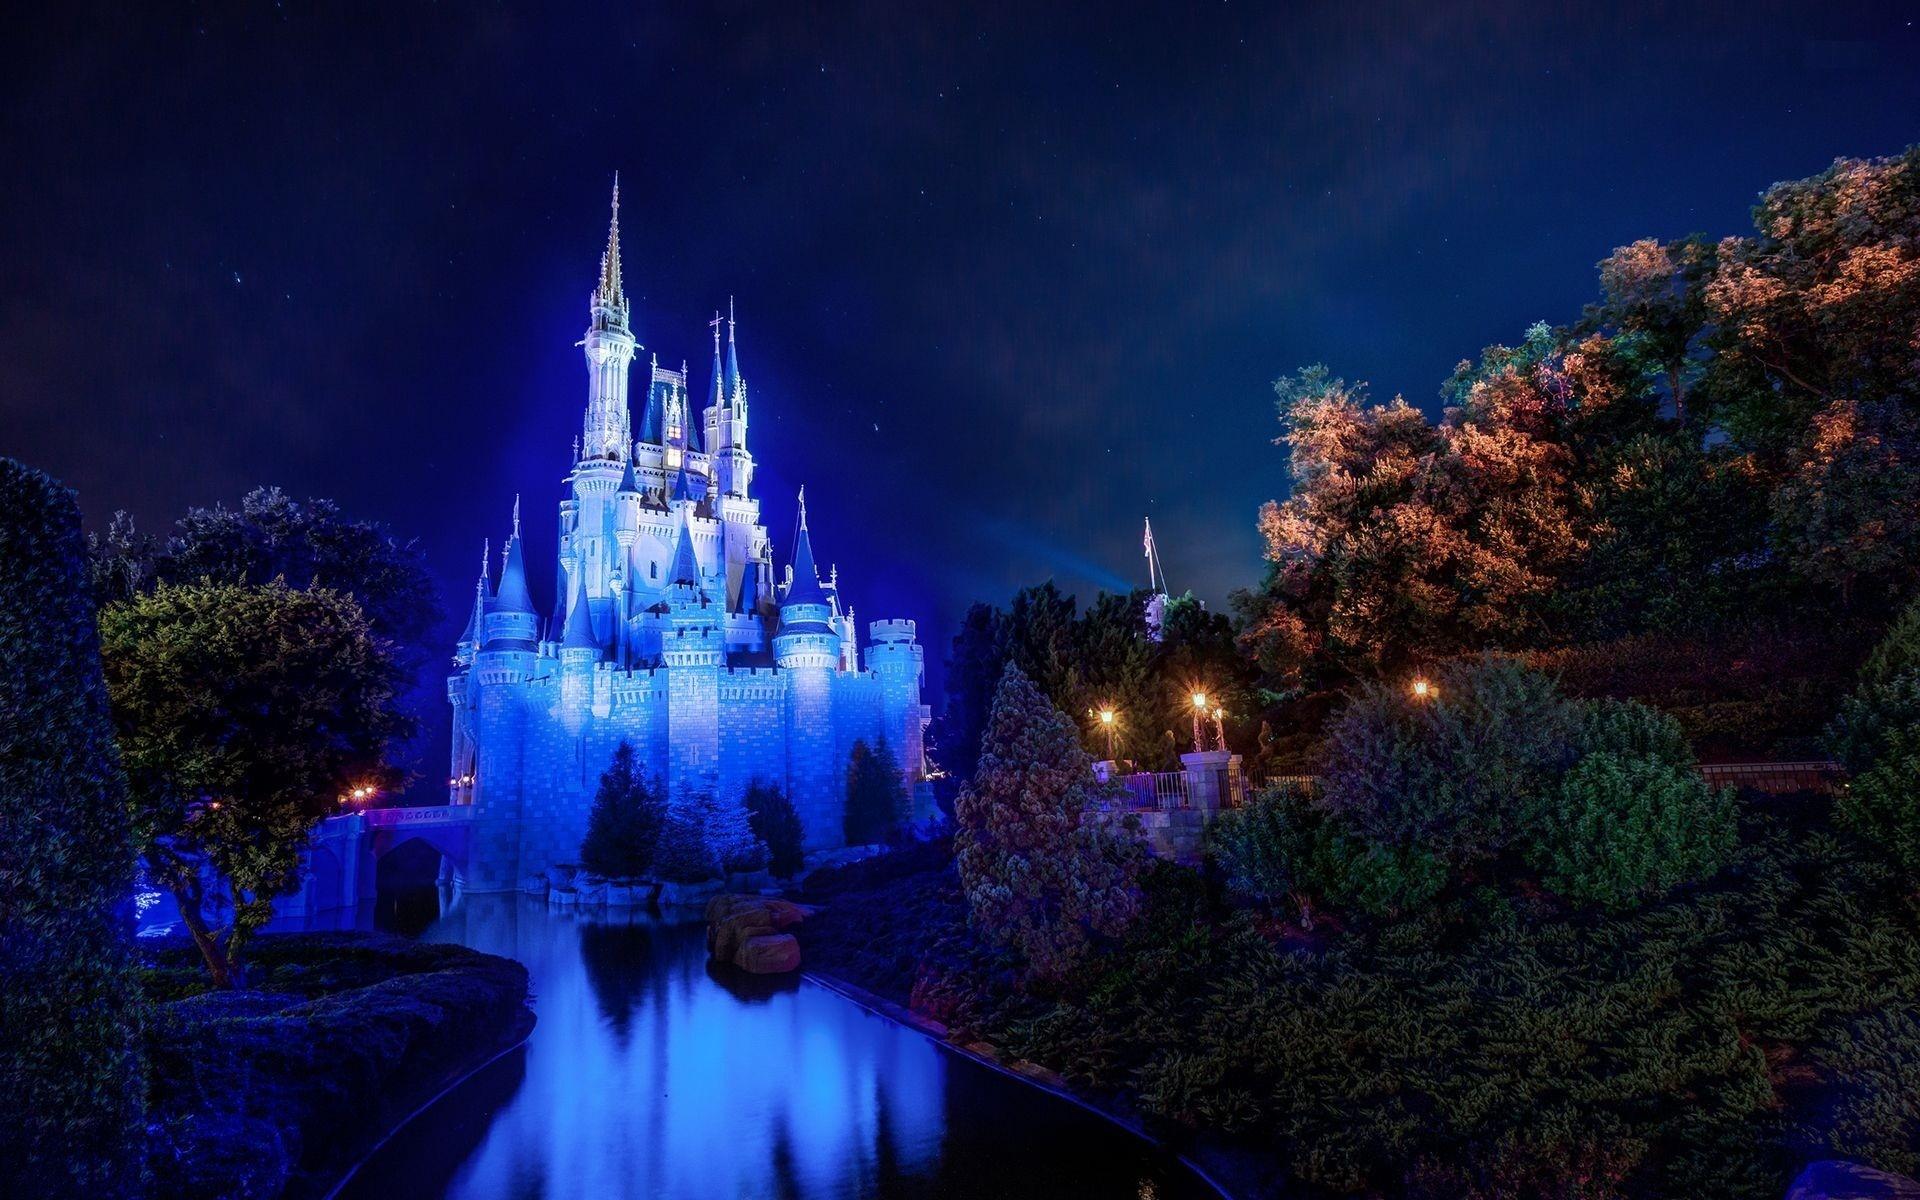 Disney world background image hd desktop wallpaper wide free